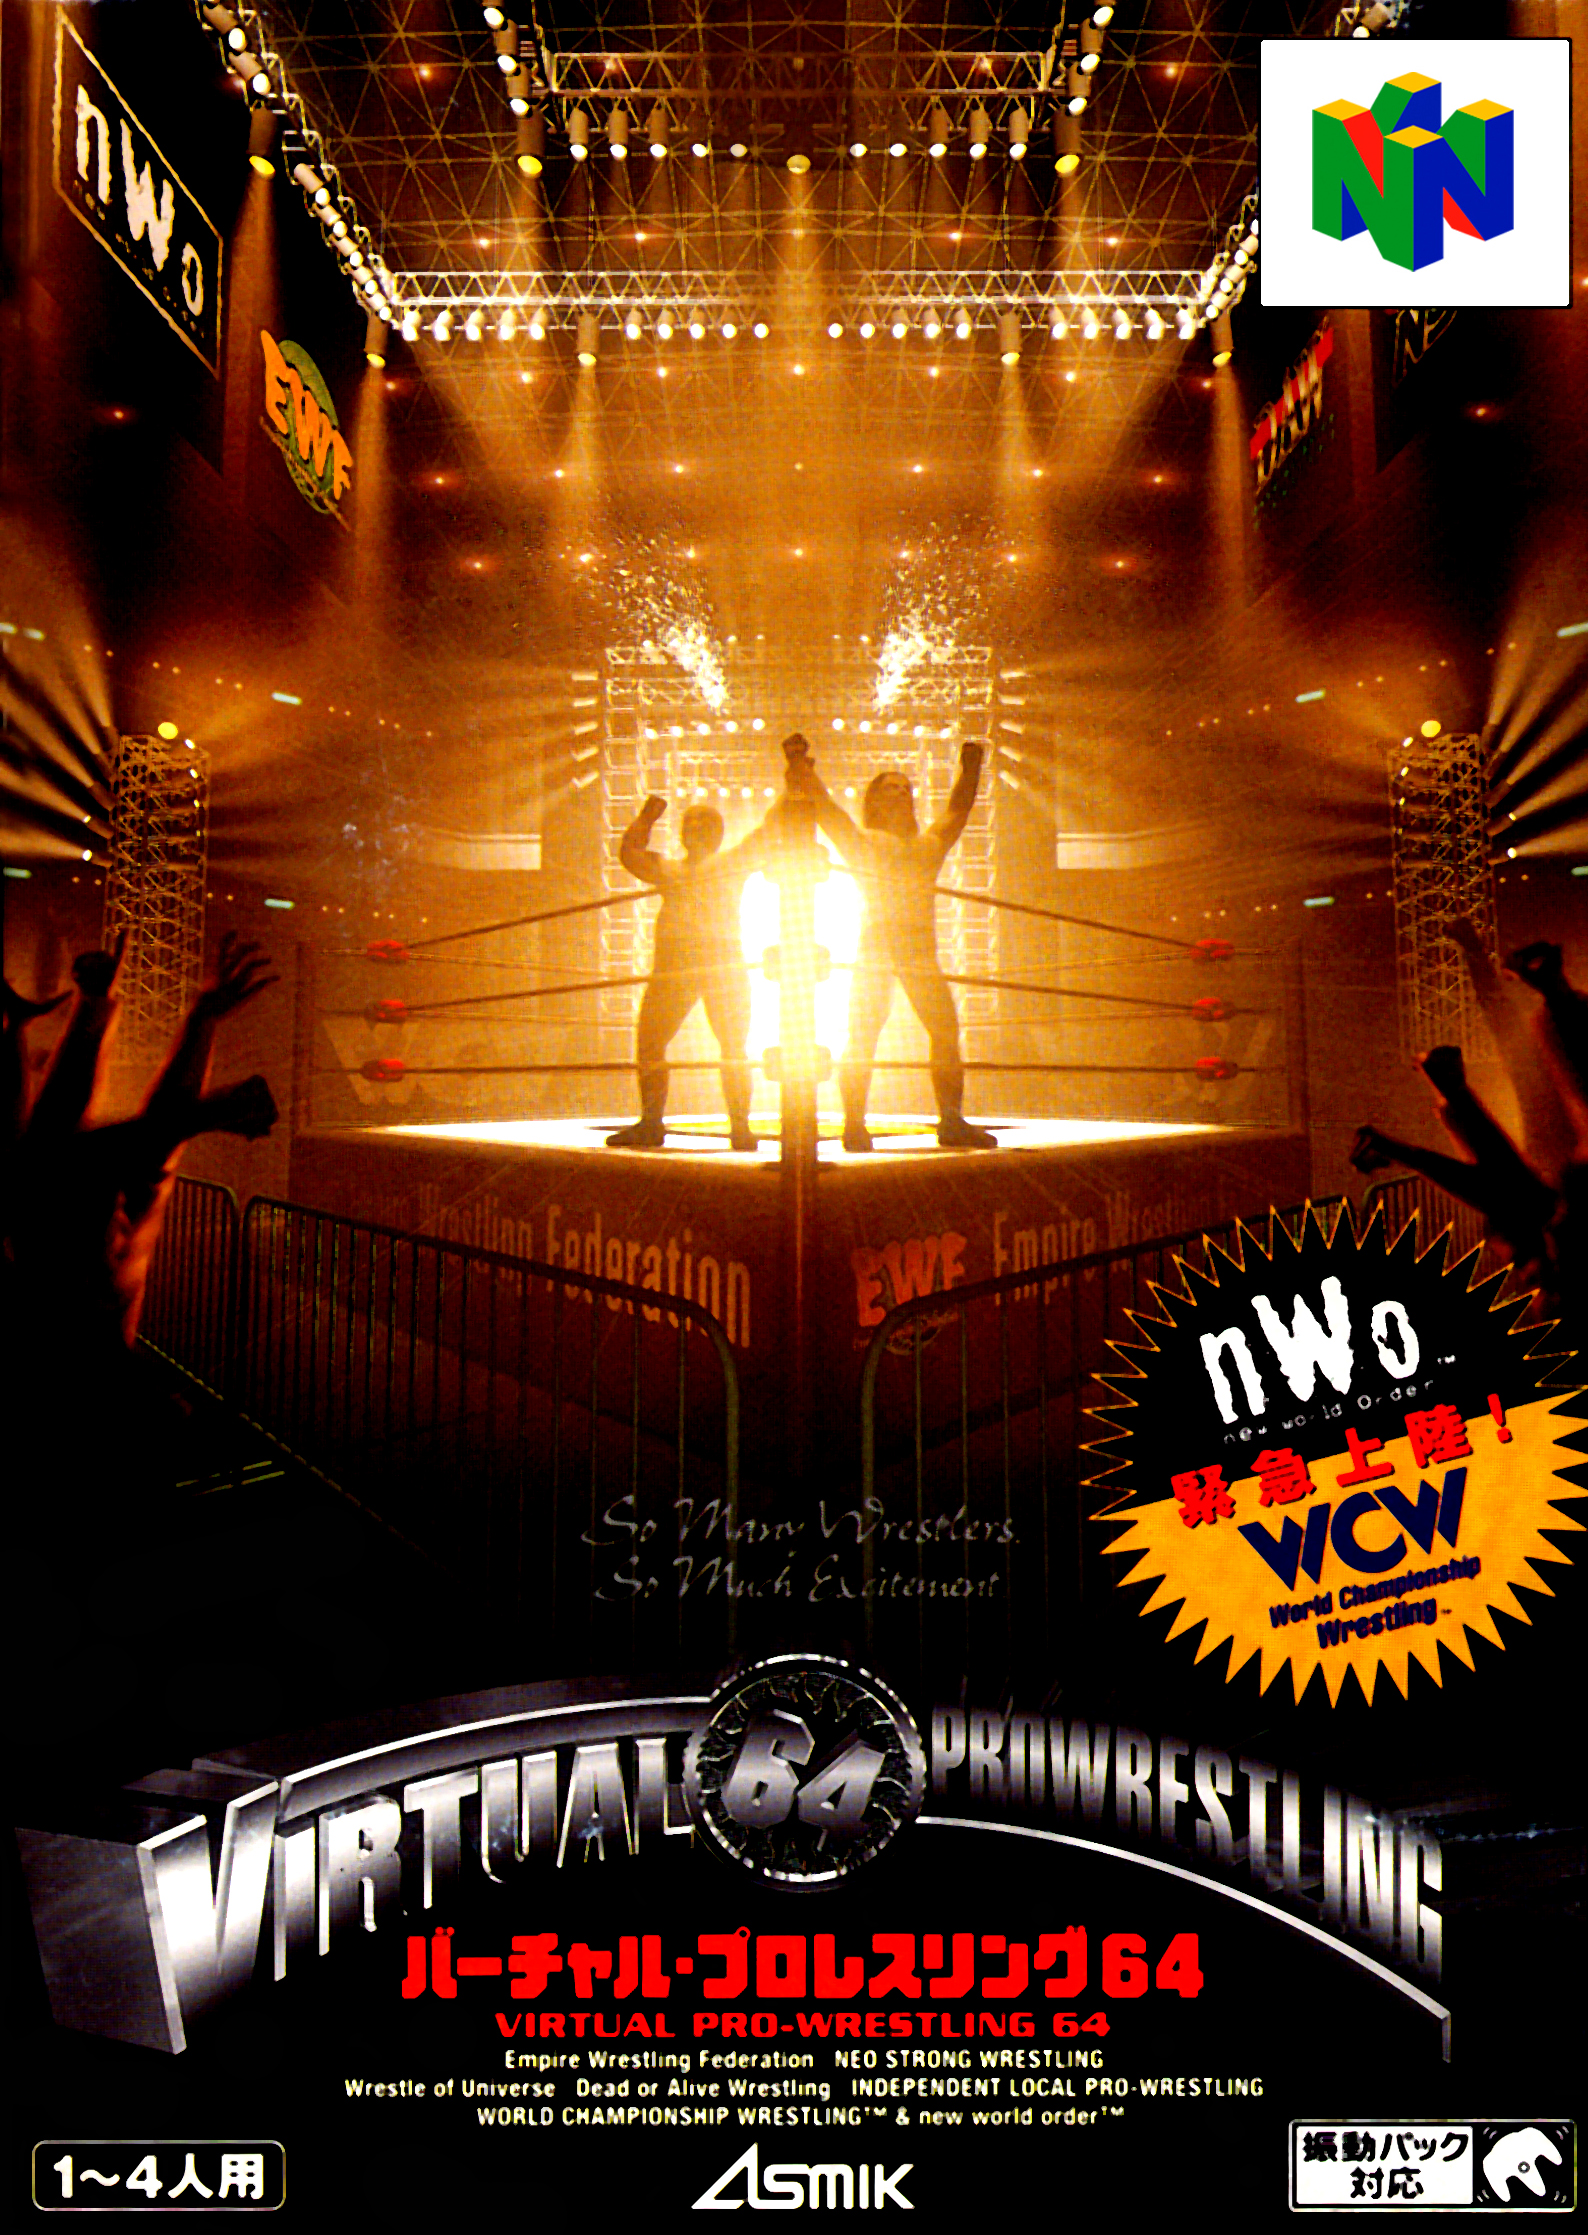 WCW Virtual Pro Wrestling